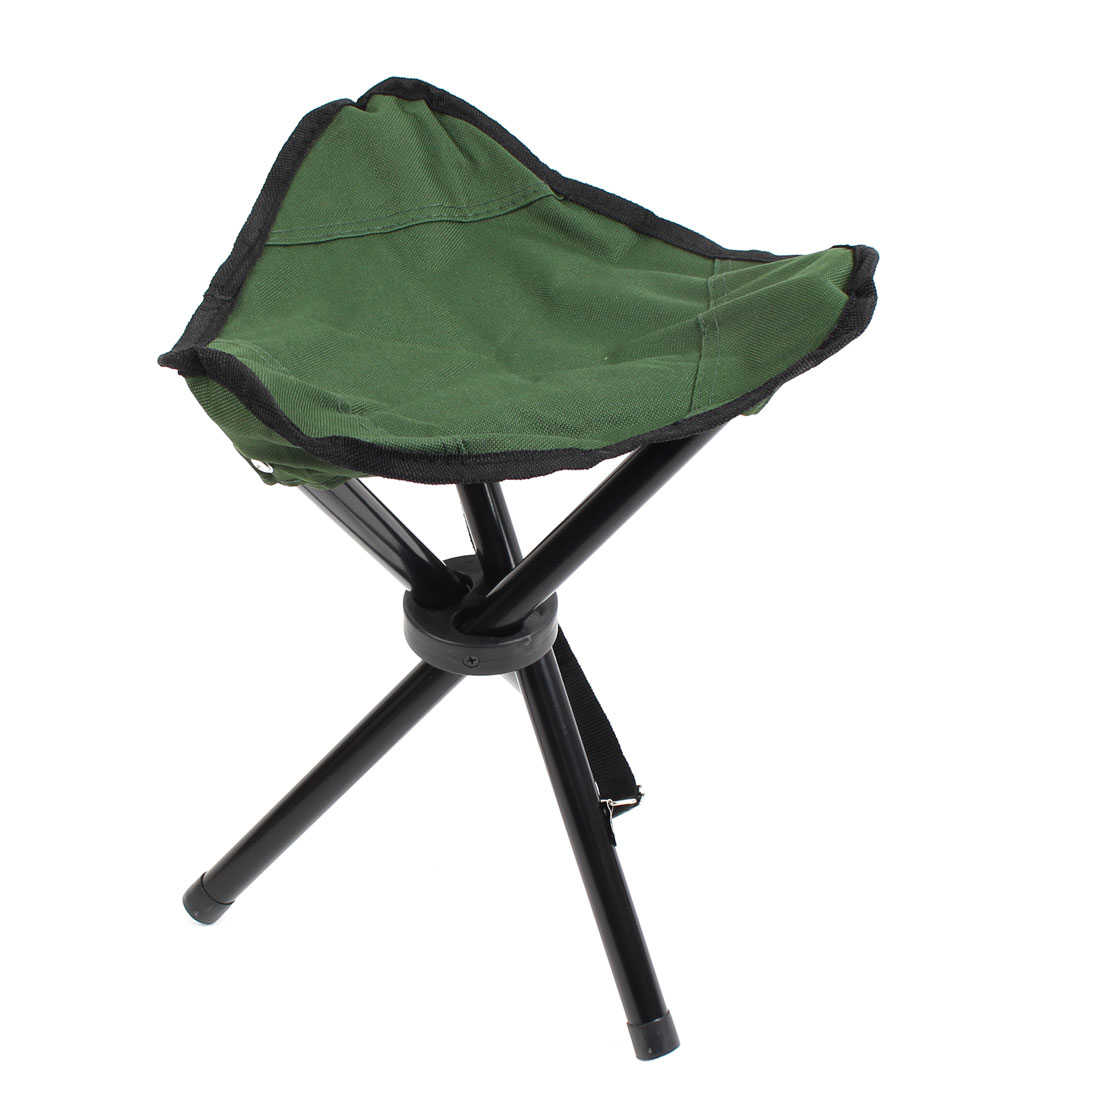 Outdoor Fishing Travel Metal Frame Nylon Seat Portable Folding Tripod Chair Stool Green